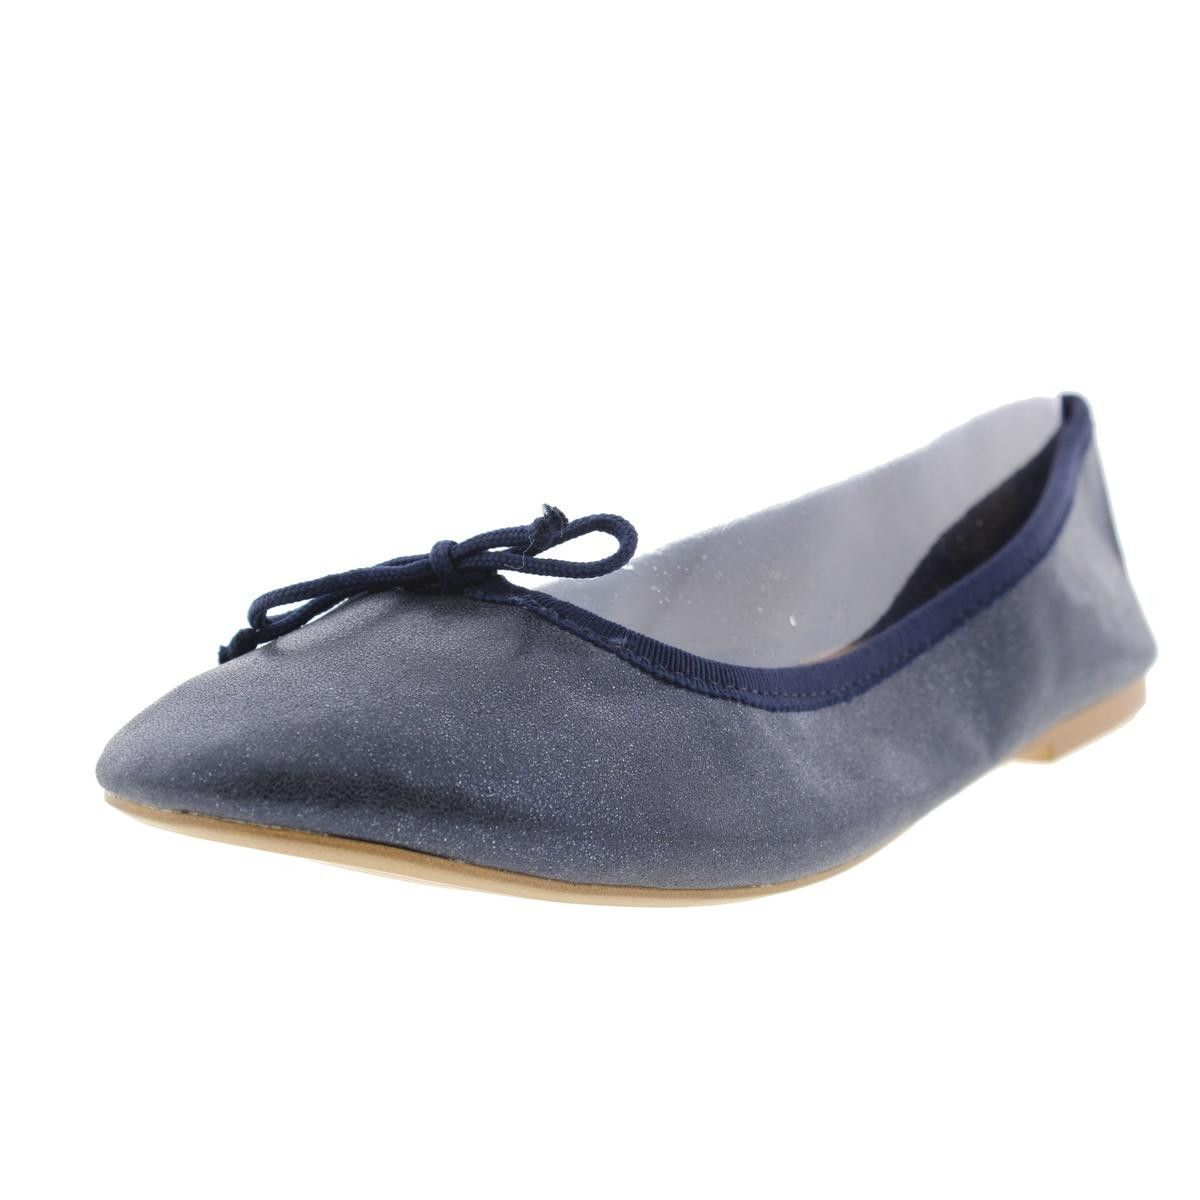 00264c6bd75 Zara Girls Metallic Ballet Flats